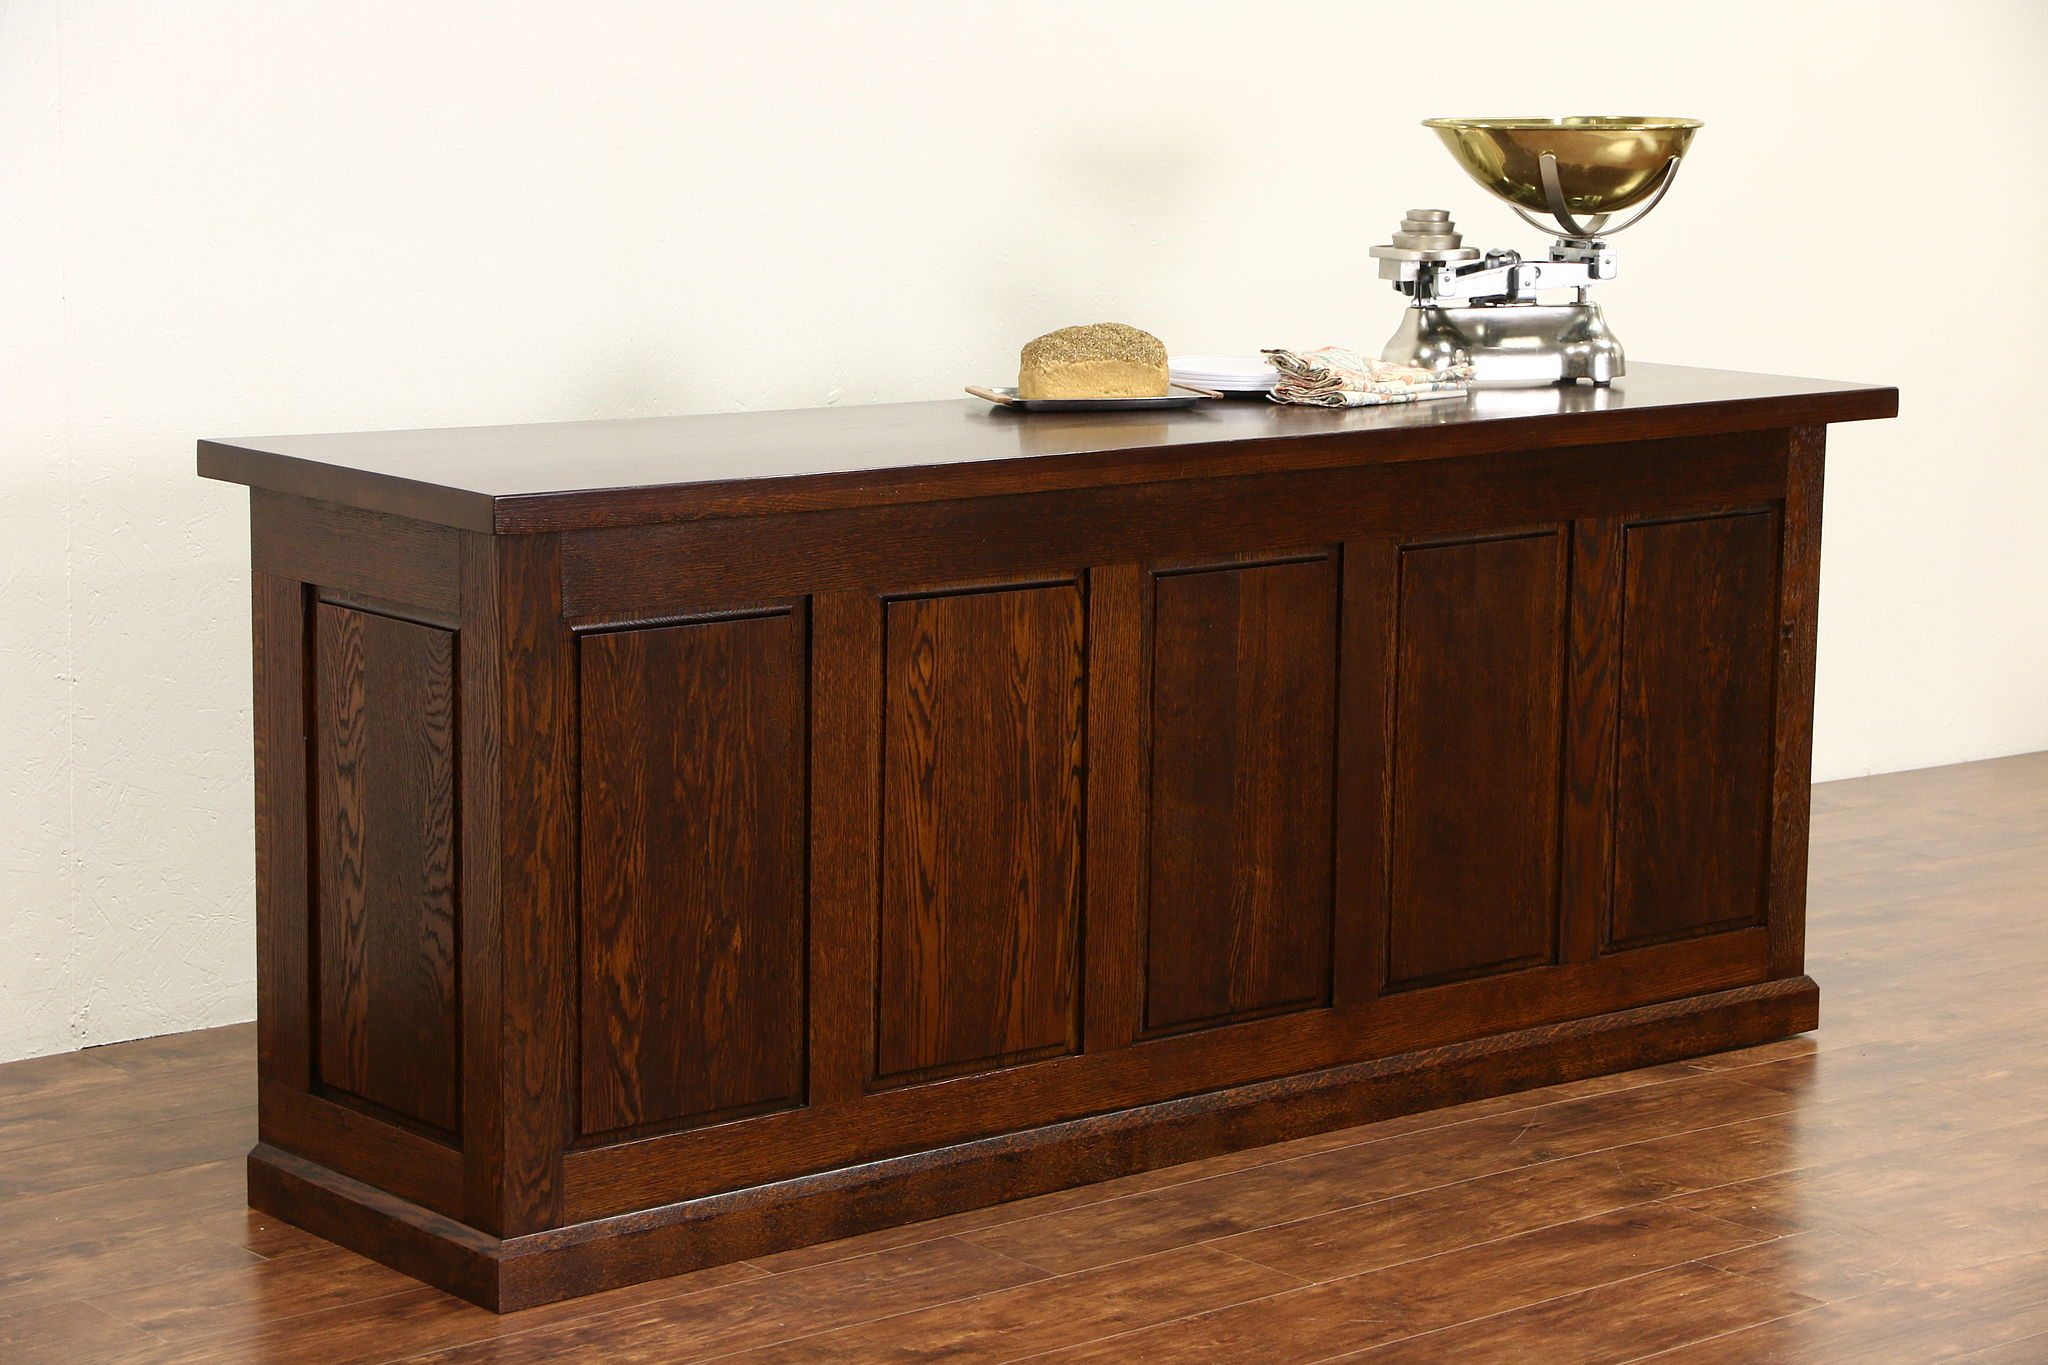 sold oak 1900 craftsman store counter bar or kitchen island oak 1900 craftsman store counter bar or kitchen island raised panels